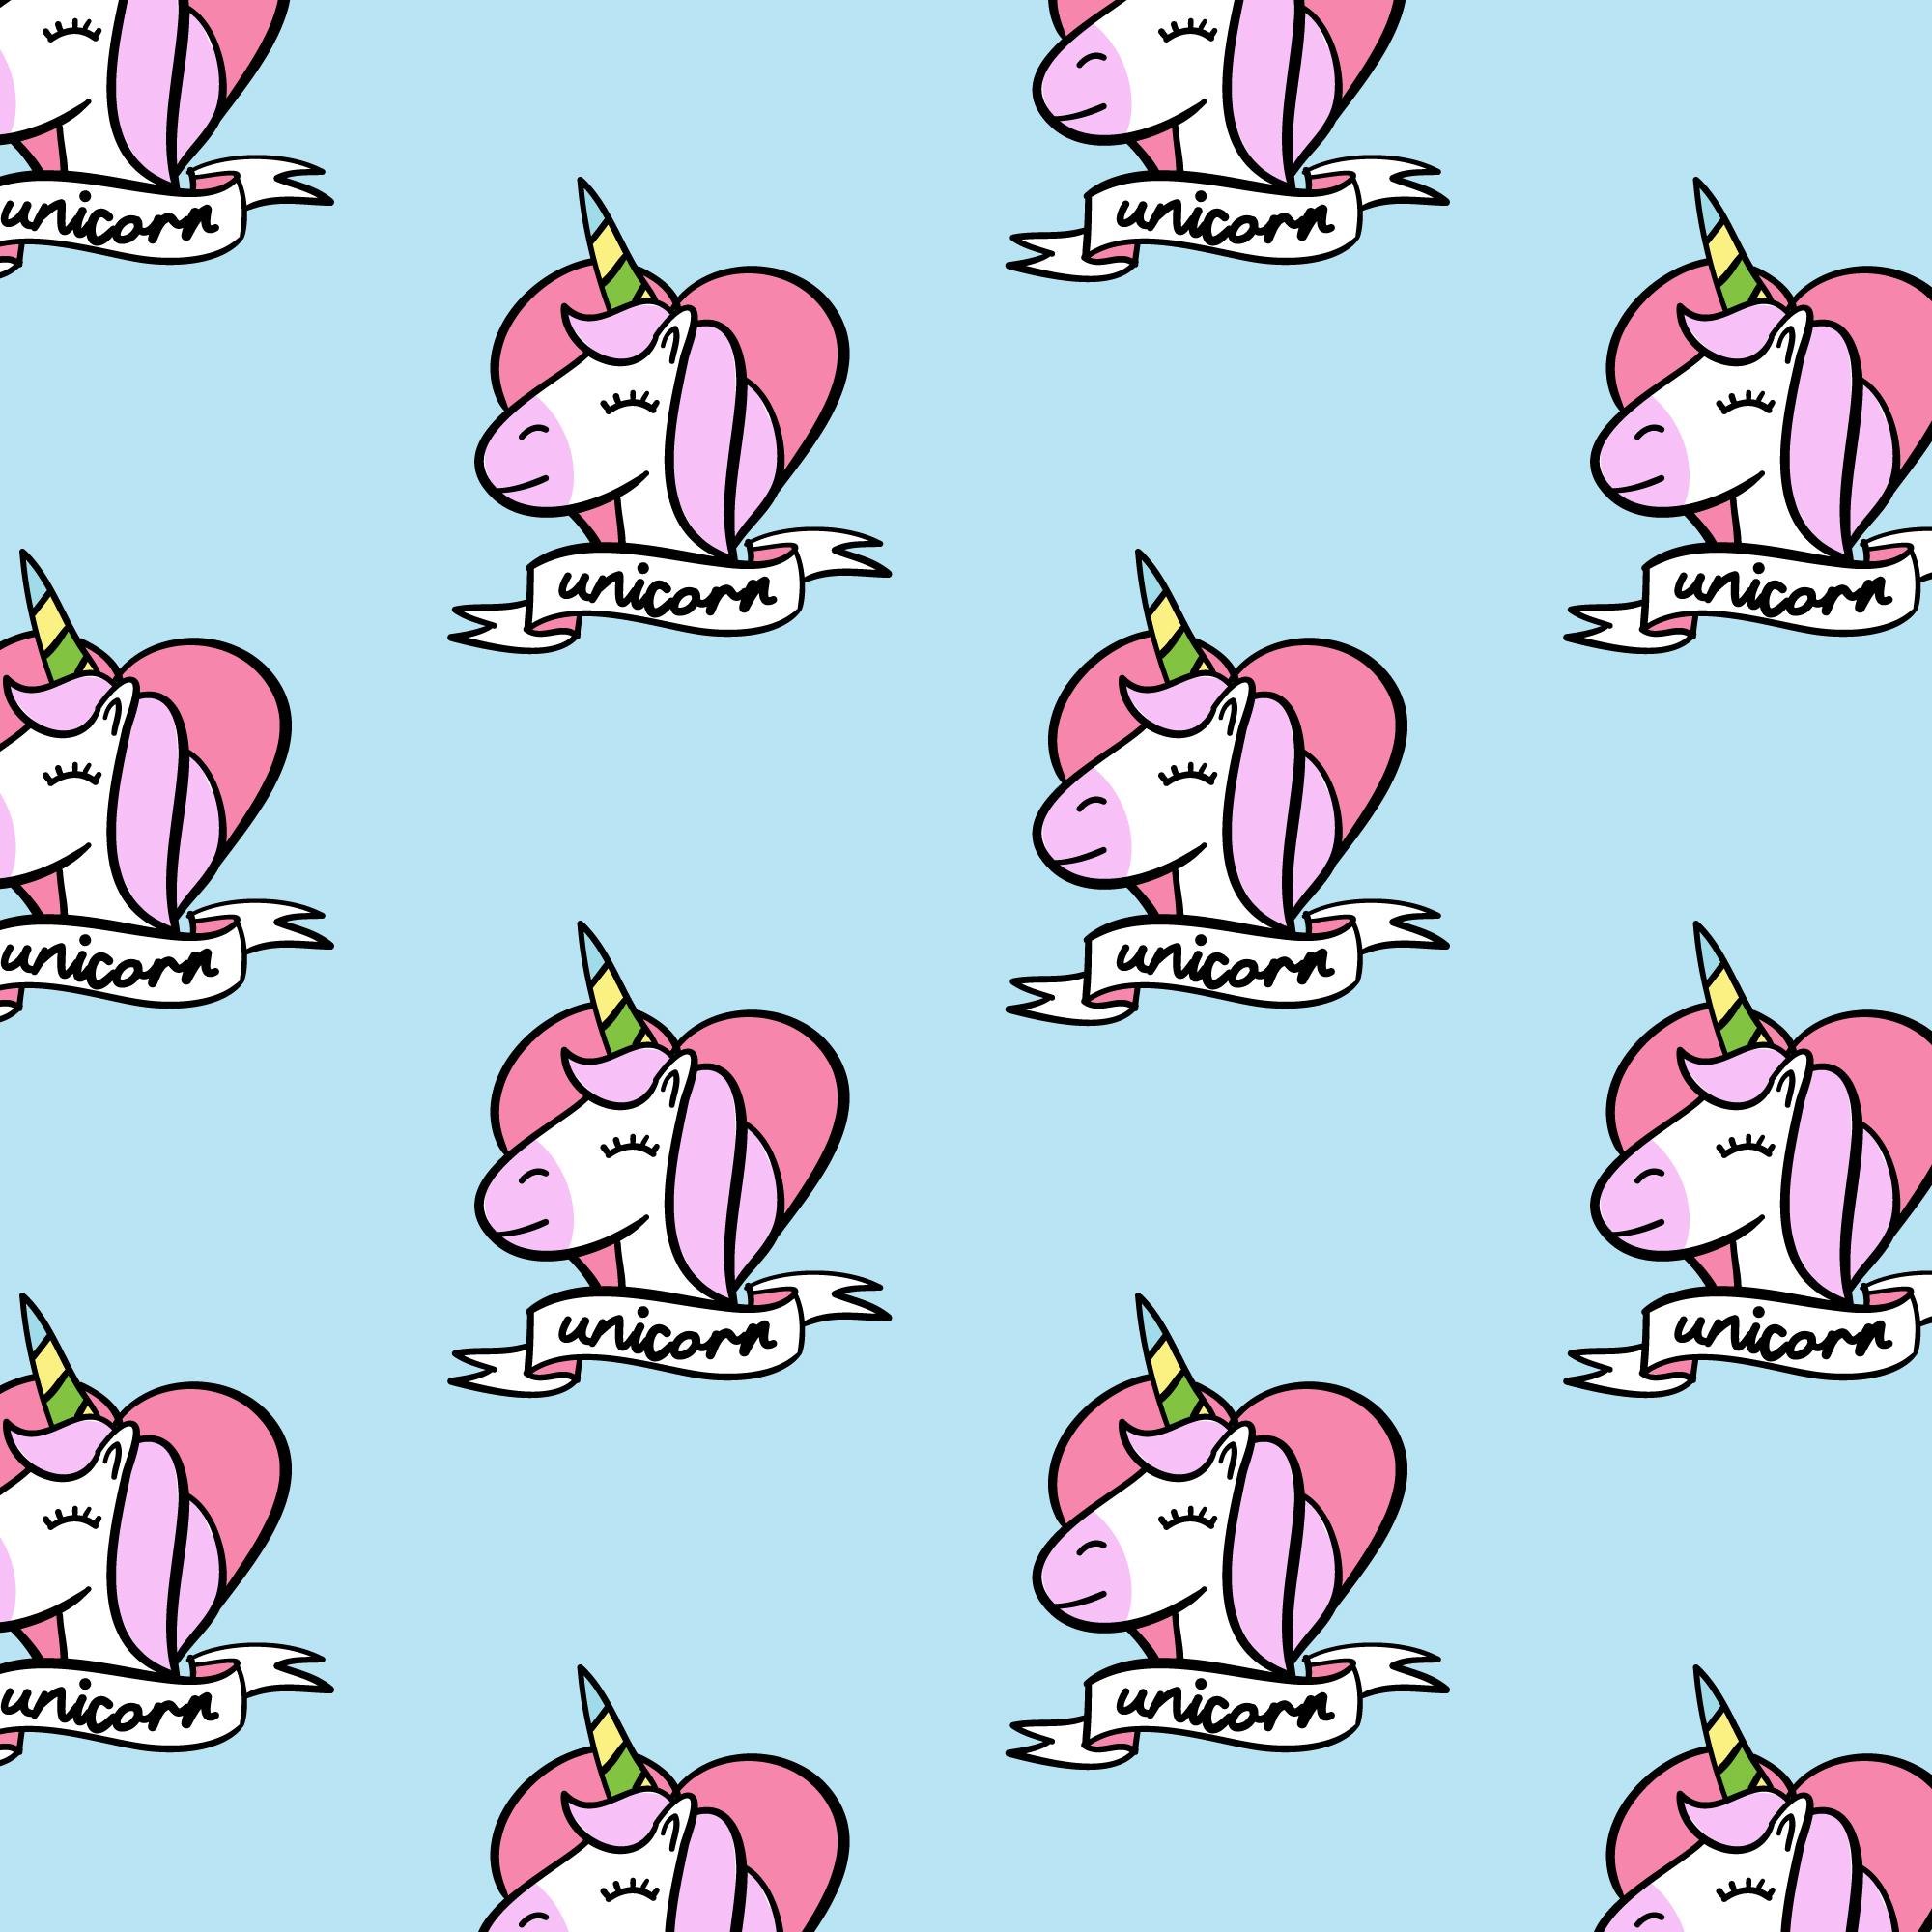 cartoon unicorn seamless pattern background  download